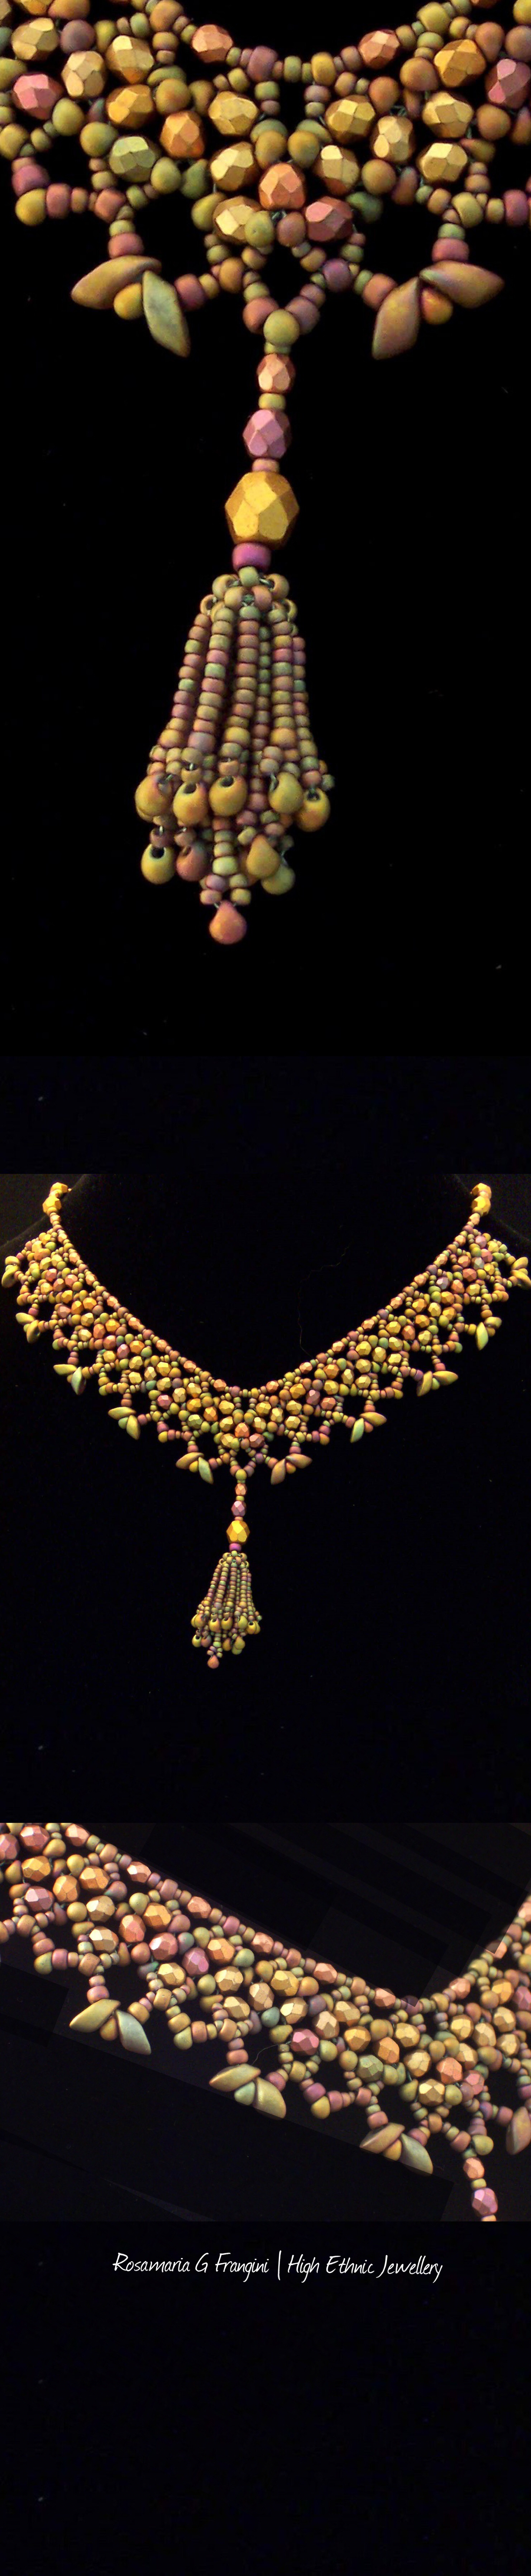 Rosamaria g frangini high ethnic jewellery the lionus tale